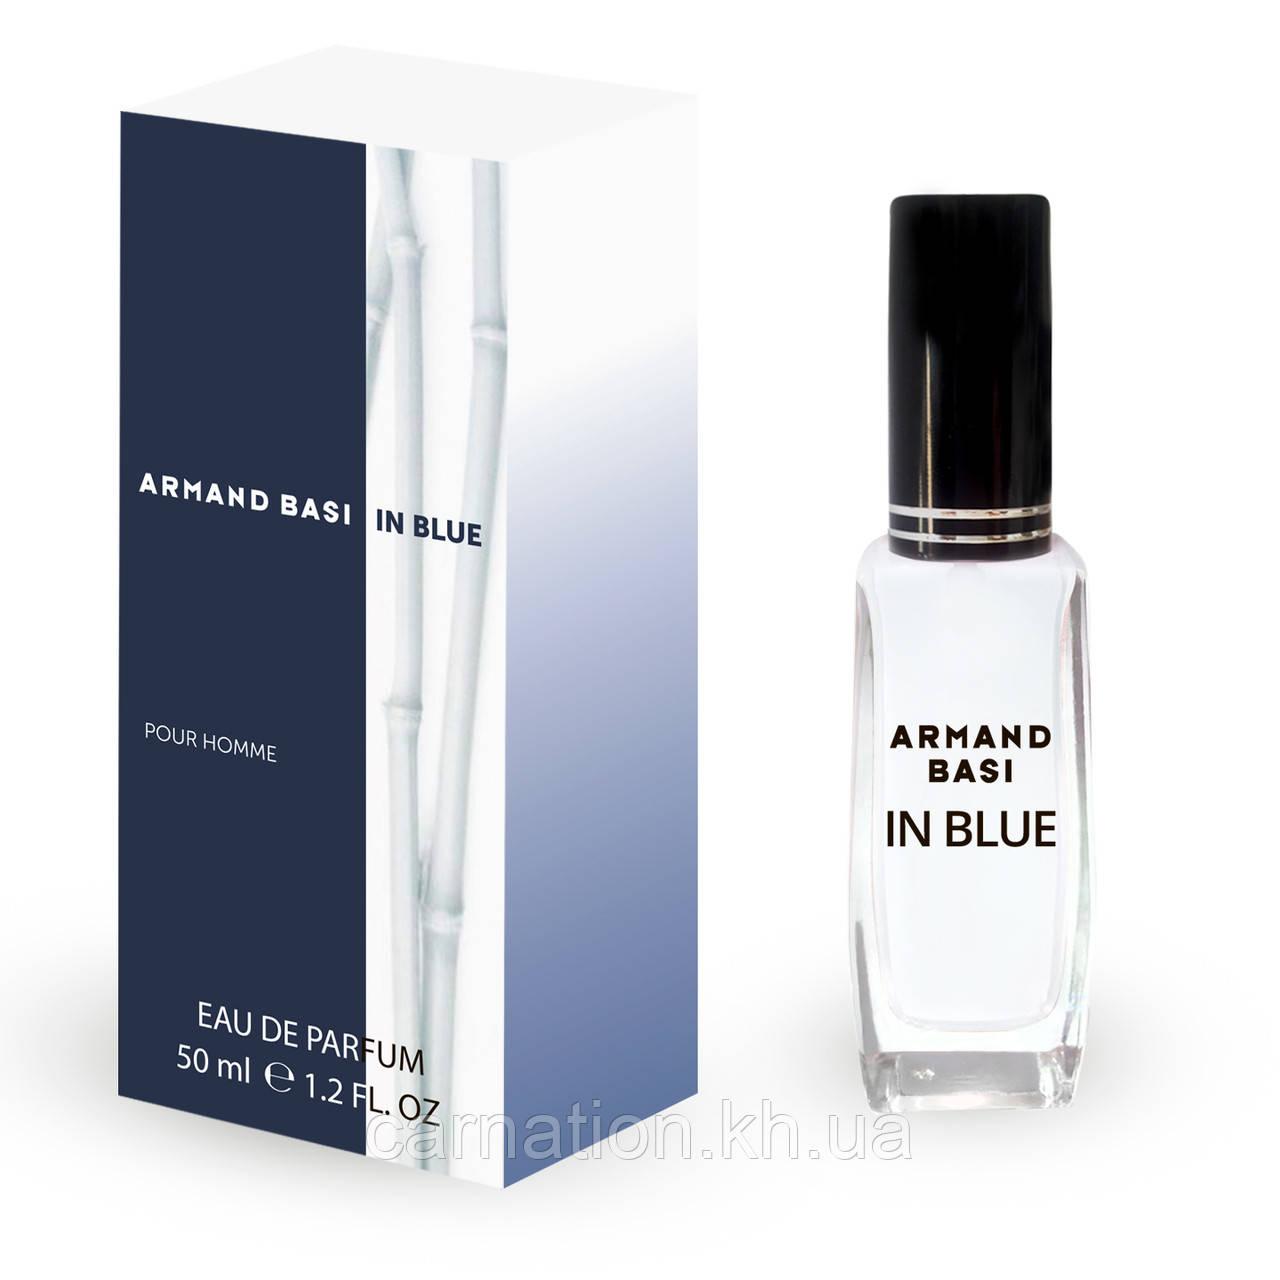 Мужской мини парфюм Armand Basi In Blue 50 мл